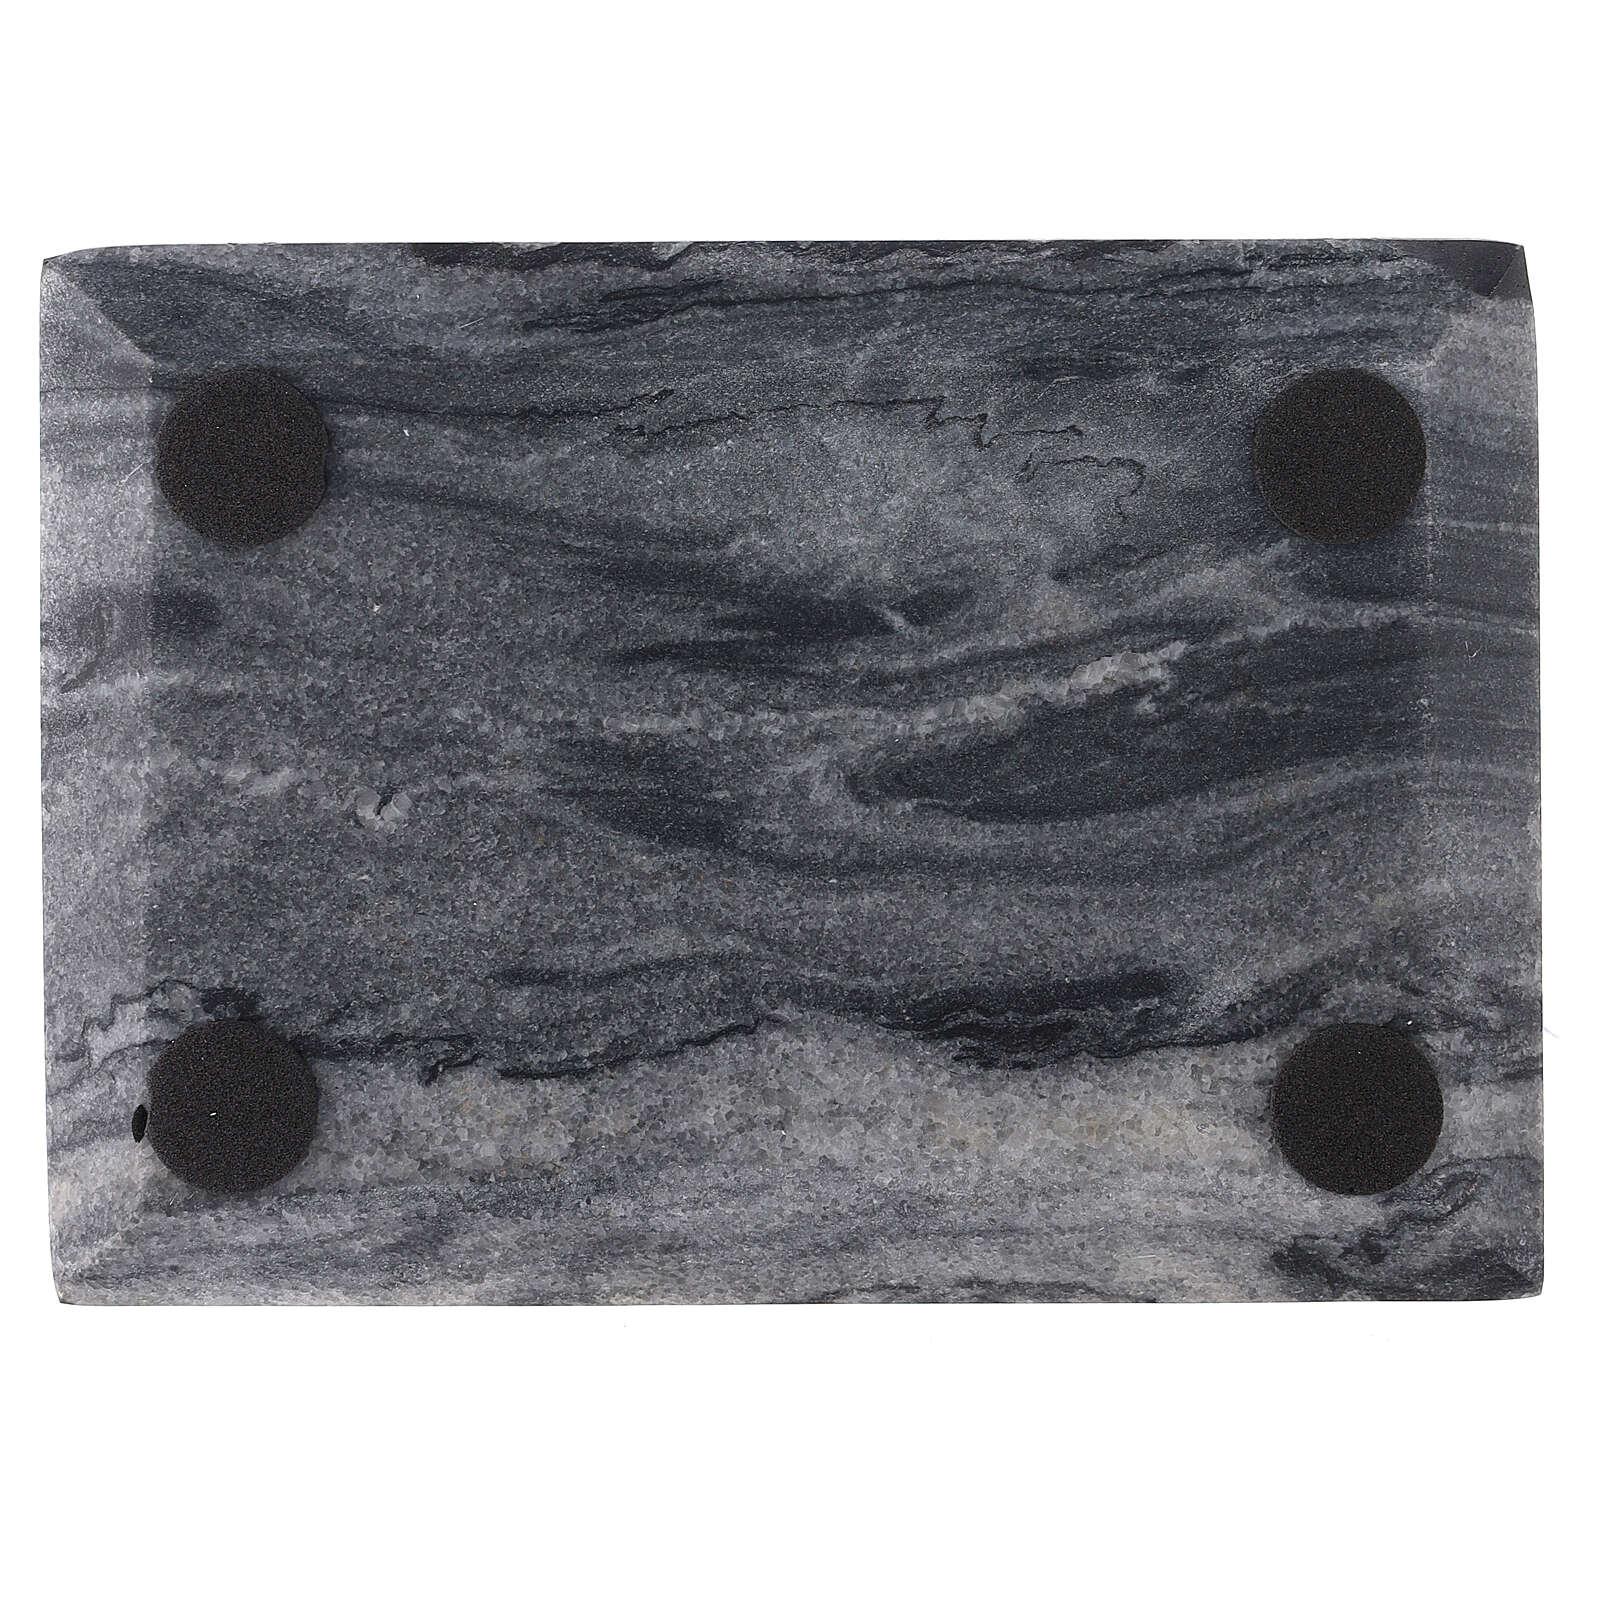 Plato portacirio rectangular piedra natural 17x12 3